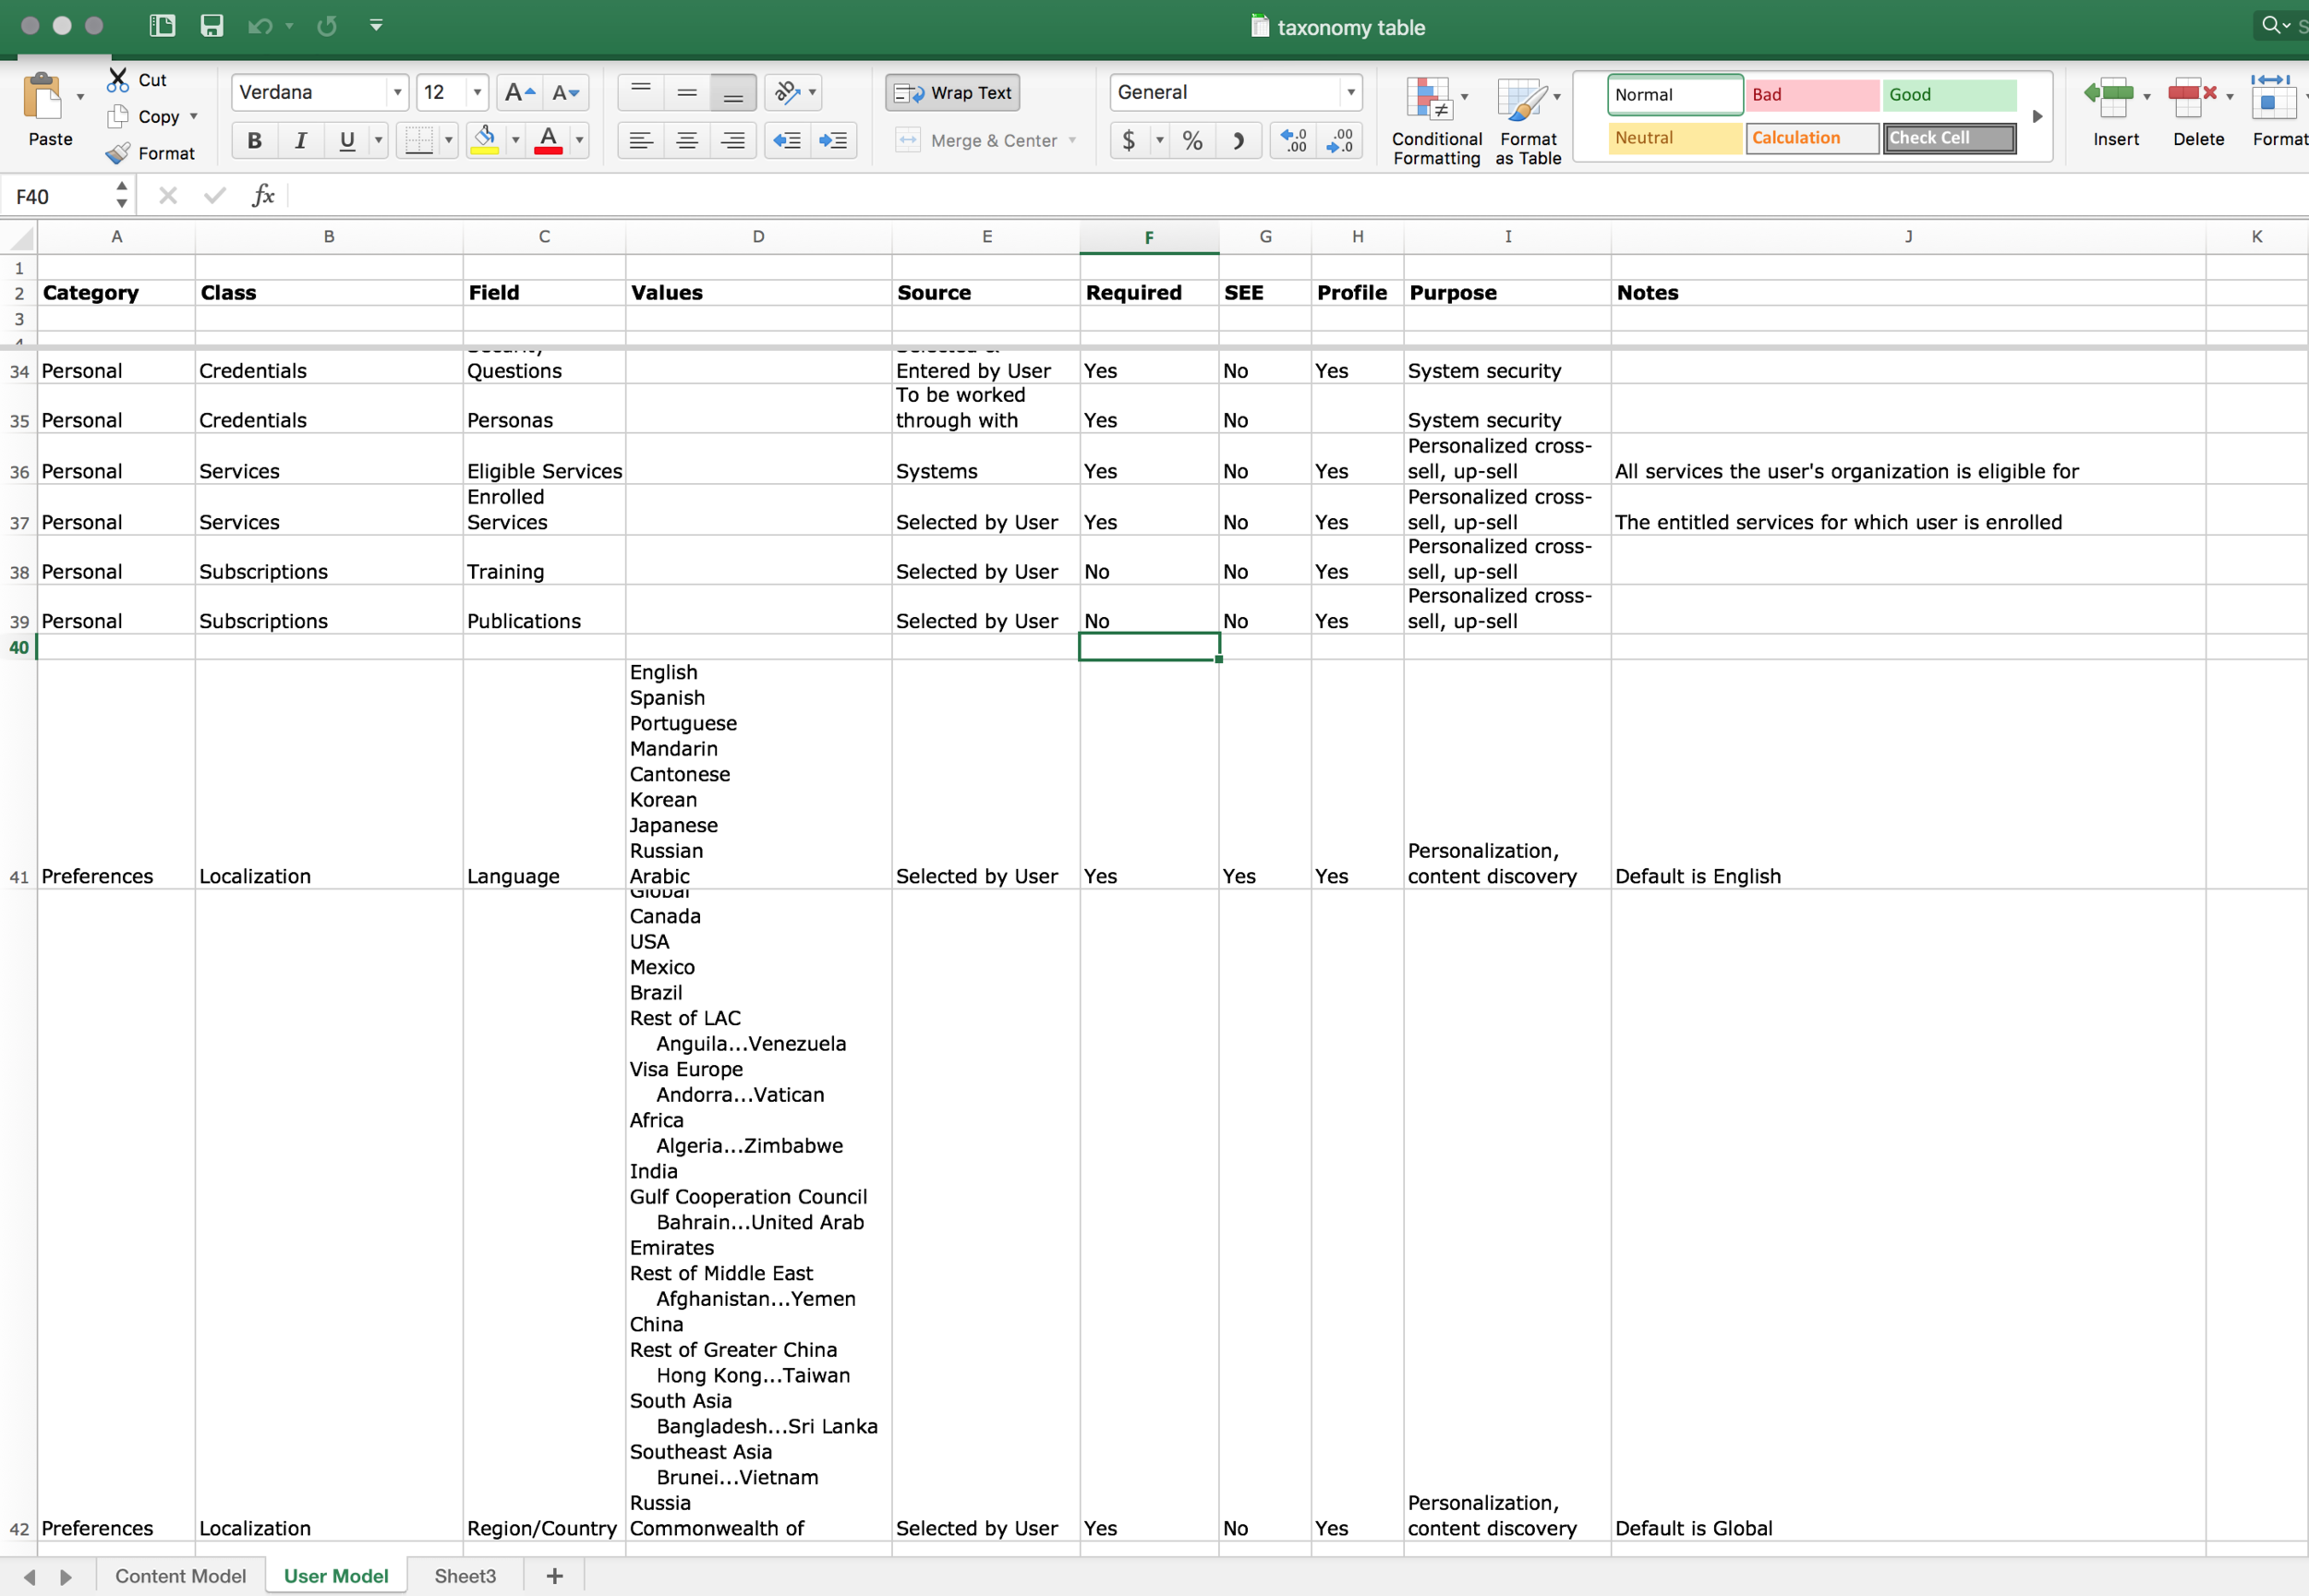 Taxonomy User Model